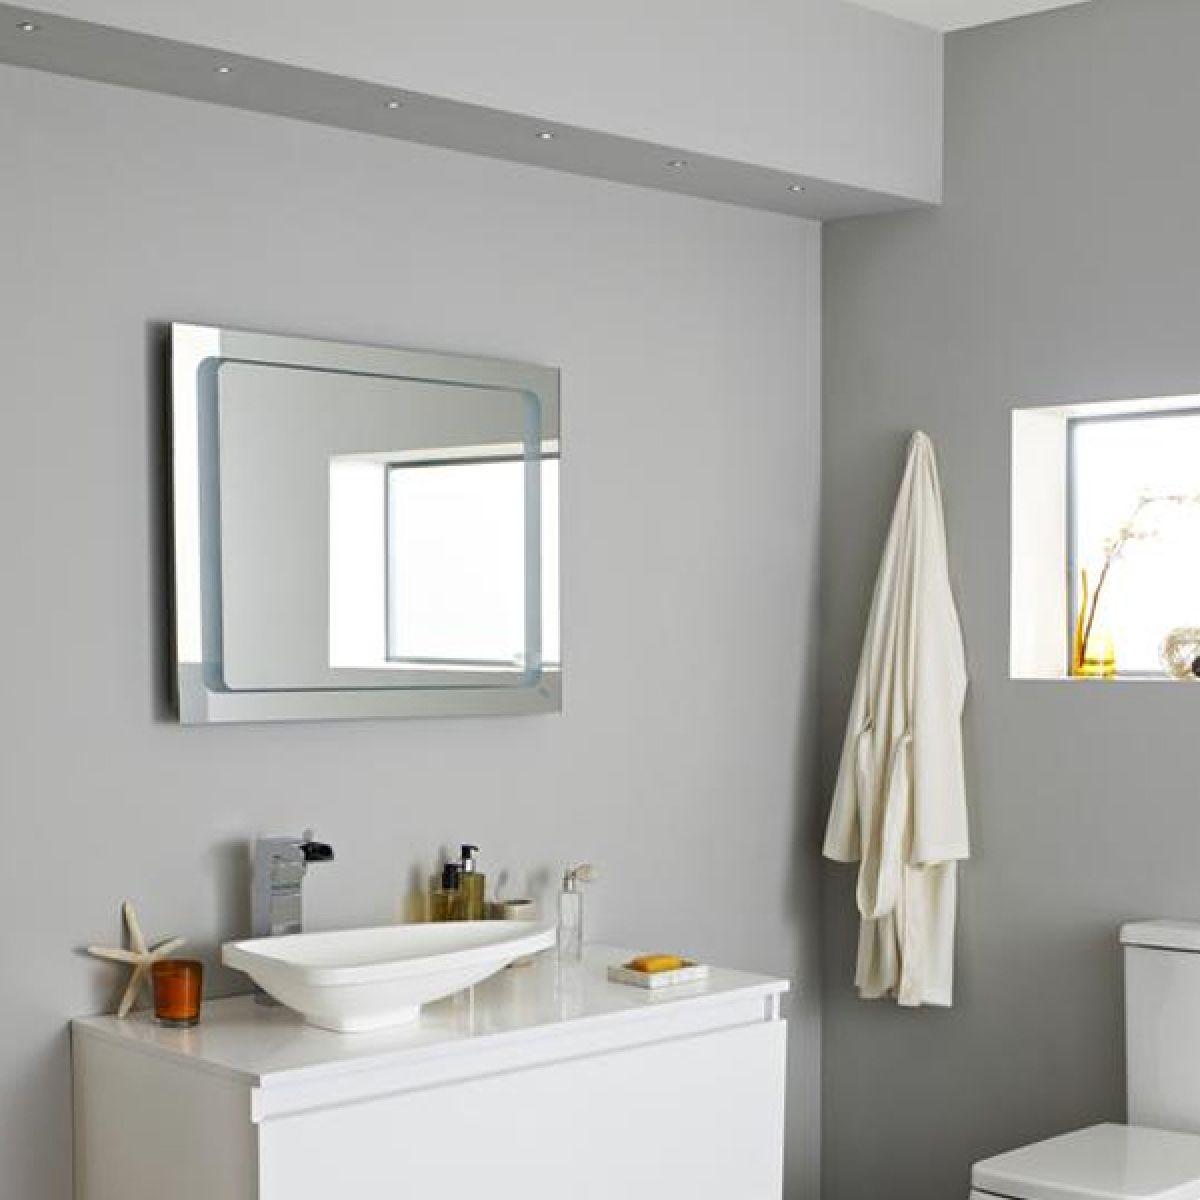 Hudson Reed Insight Backlit Mirror with De-mist Pad & Motion Sensor Technology